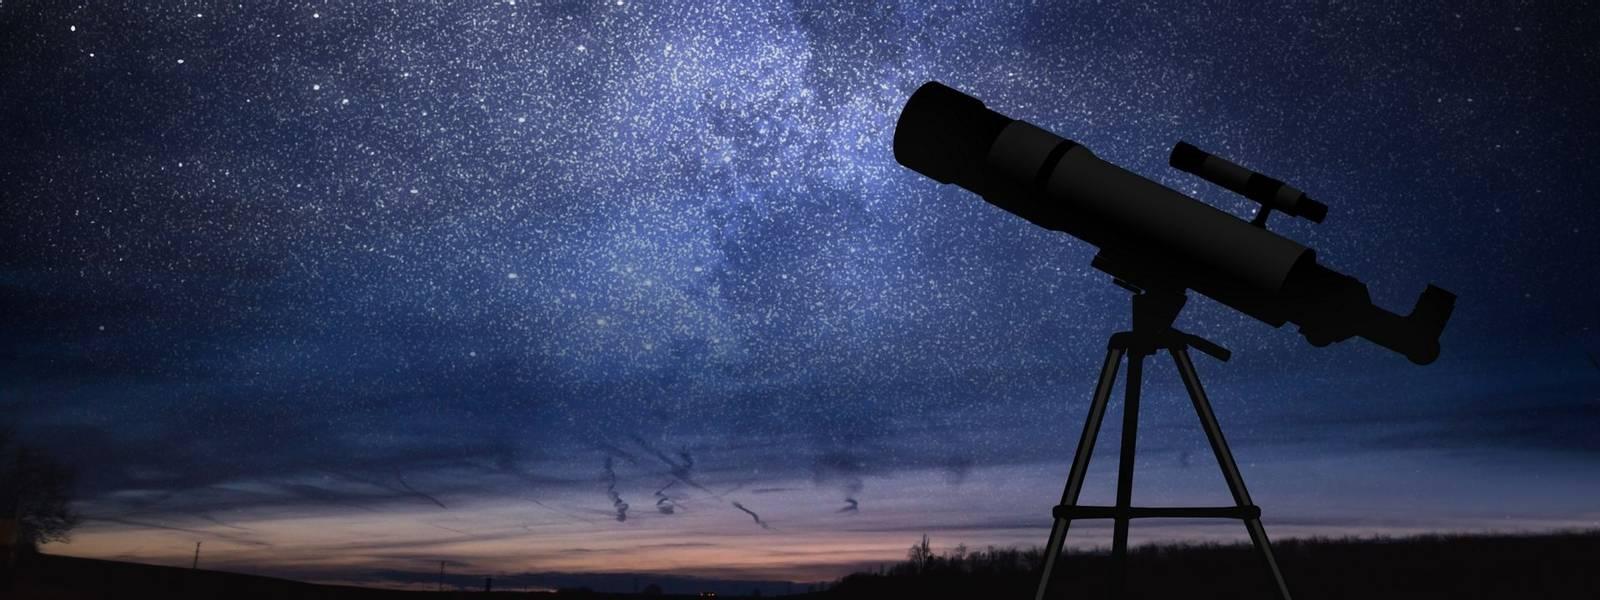 Leisure - Natural World - Astronomy - AdobeStock_138325035.jpeg